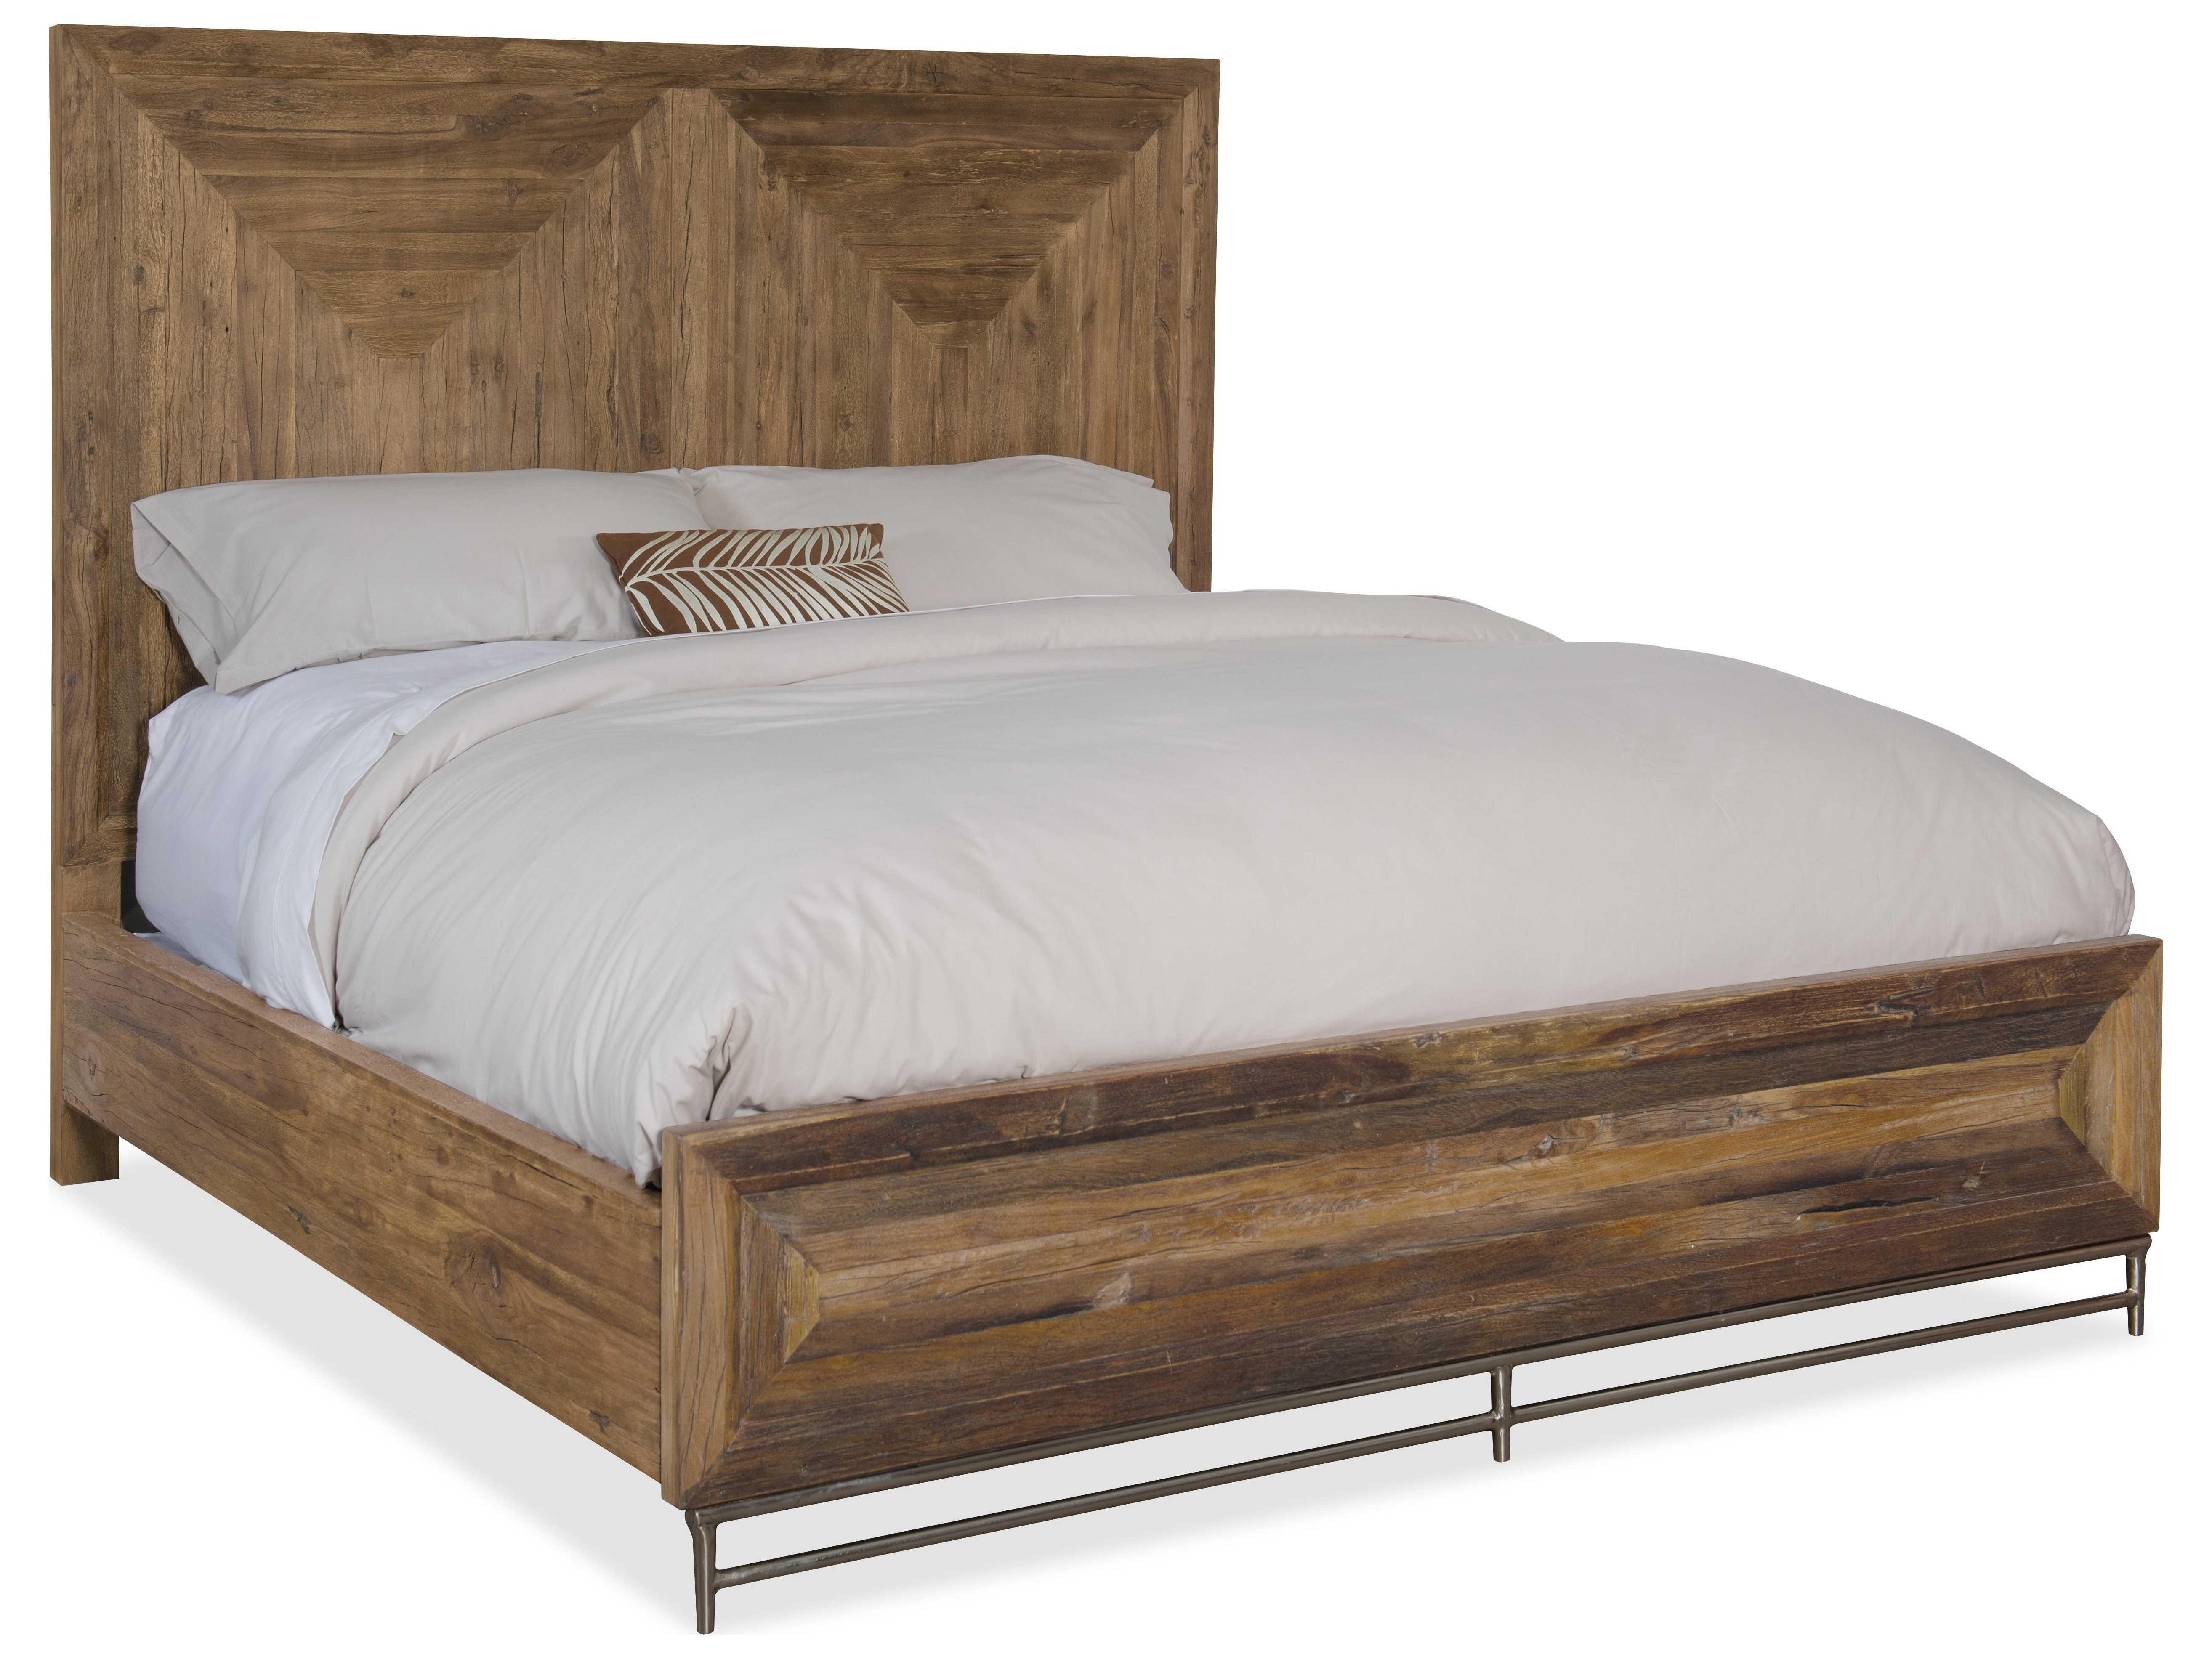 Hooker Furniture L 39 Usine Medium Wood King Size Panel Bed Hoo595090266mwd